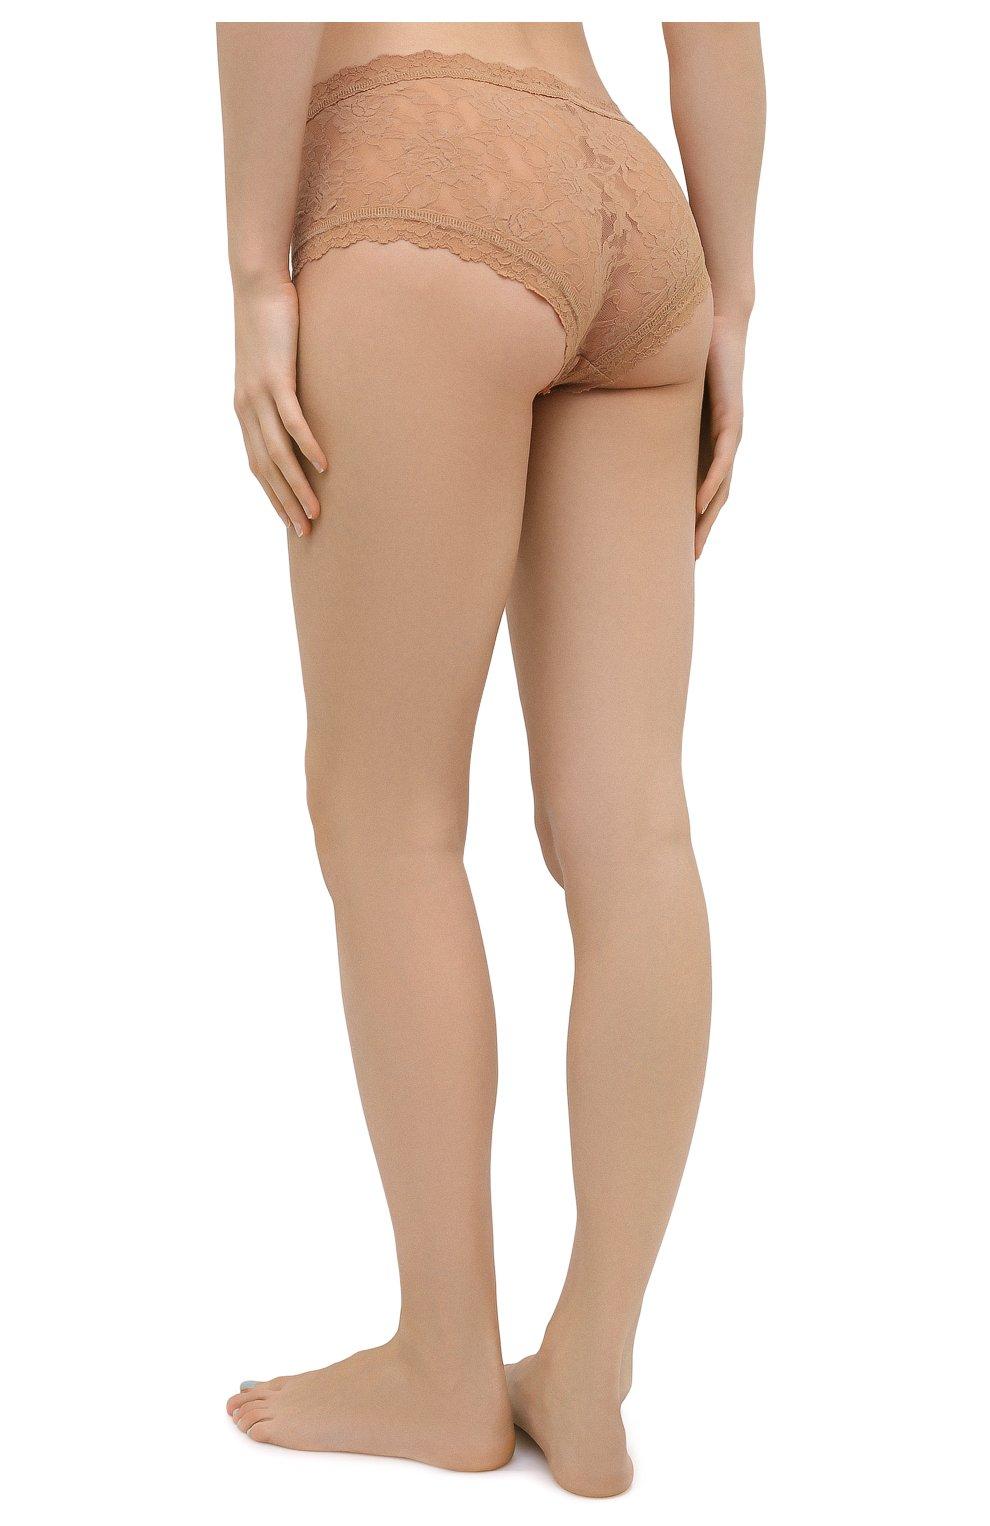 Женские трусы-шорты HANKY PANKY бежевого цвета, арт. 4812   Фото 3